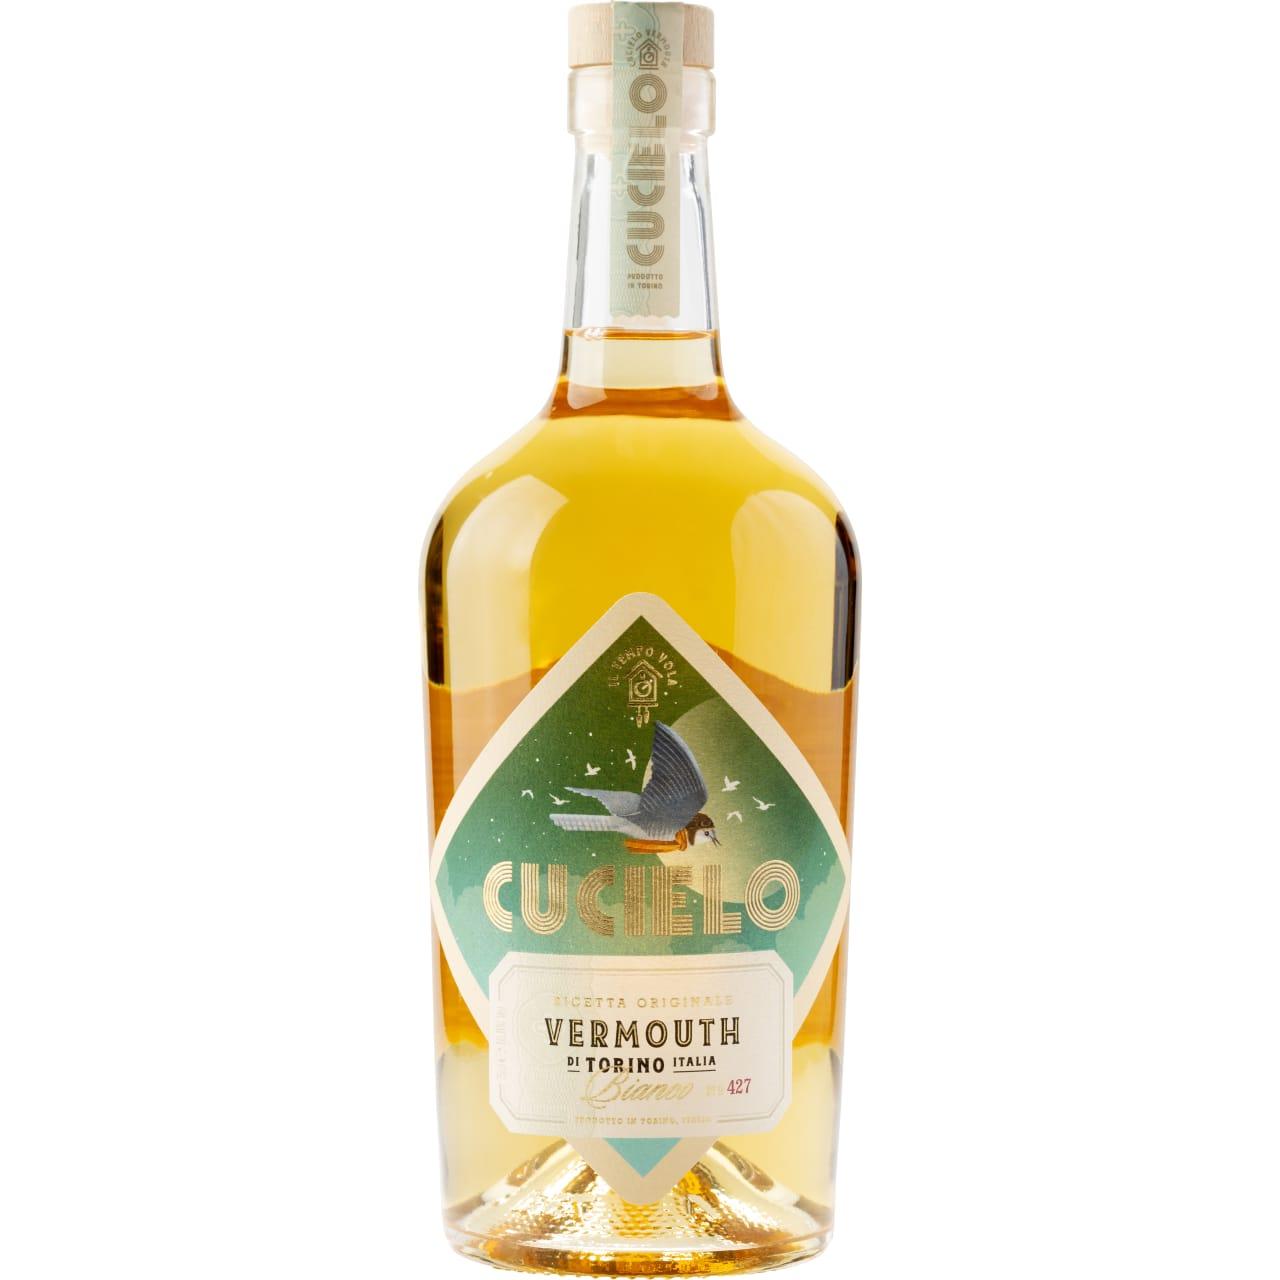 Product Image - CUCIELO Vermouth di Torino Bianco